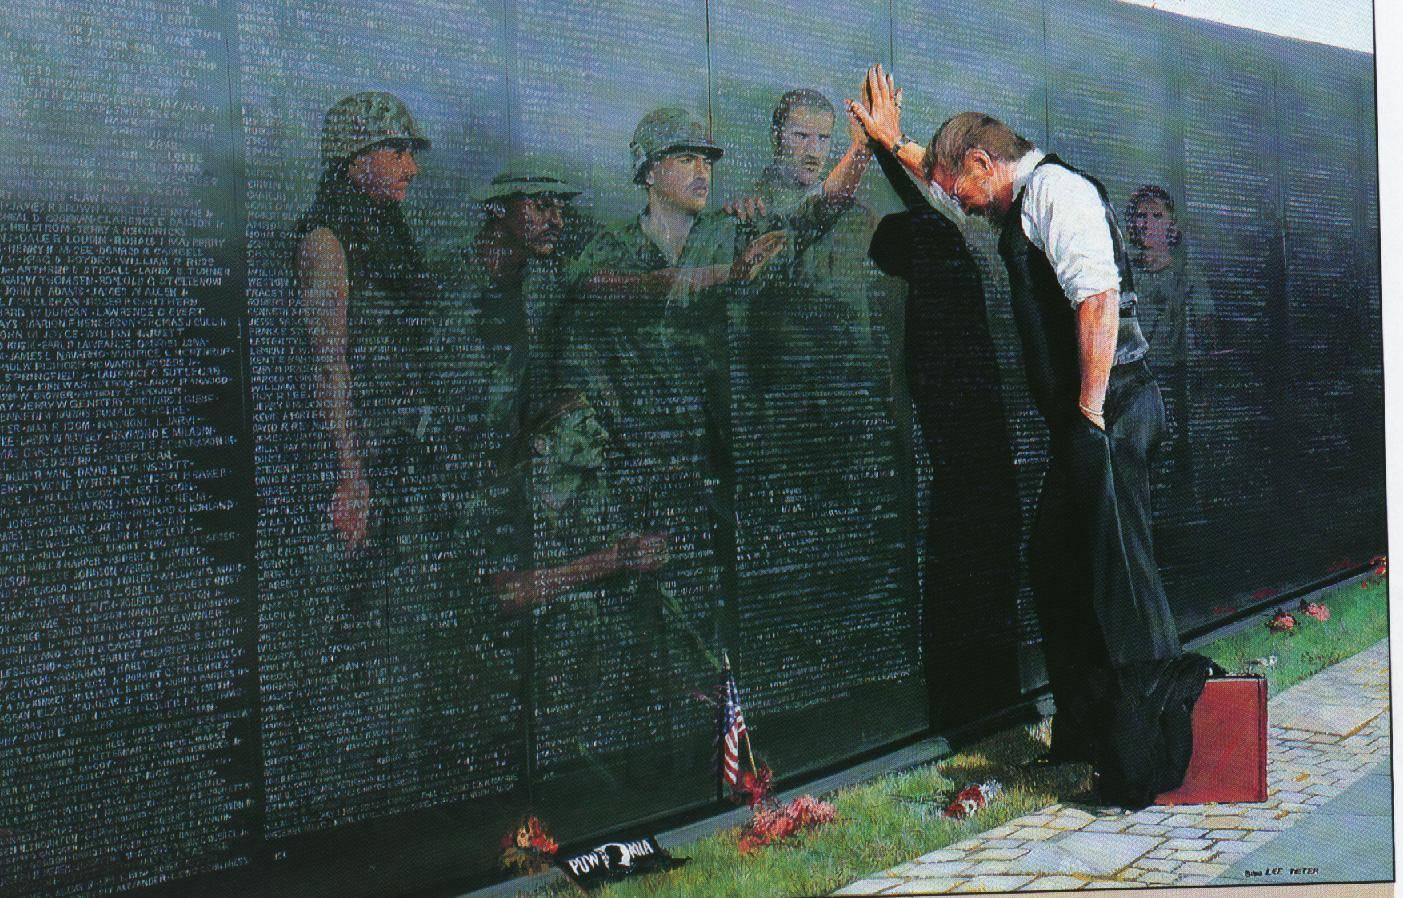 Vietnam War Monument   World History Wallpaper 1403x898